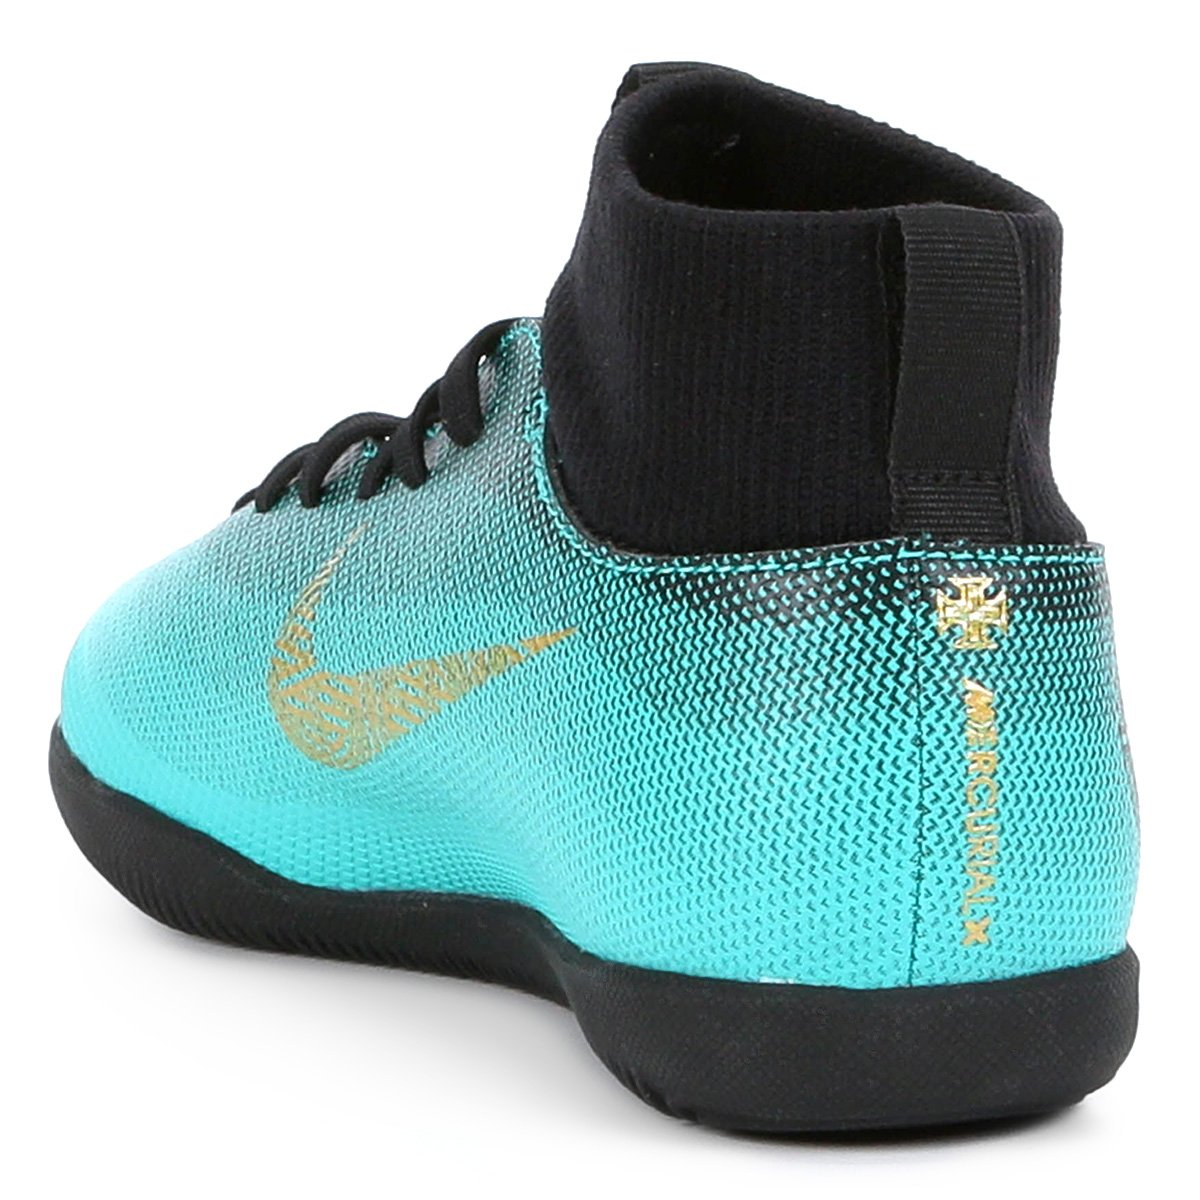 Chuteira Futsal Infantil Nike Superfly 6 Club CR7 IC - Compre Agora ... 72dc68fce3247